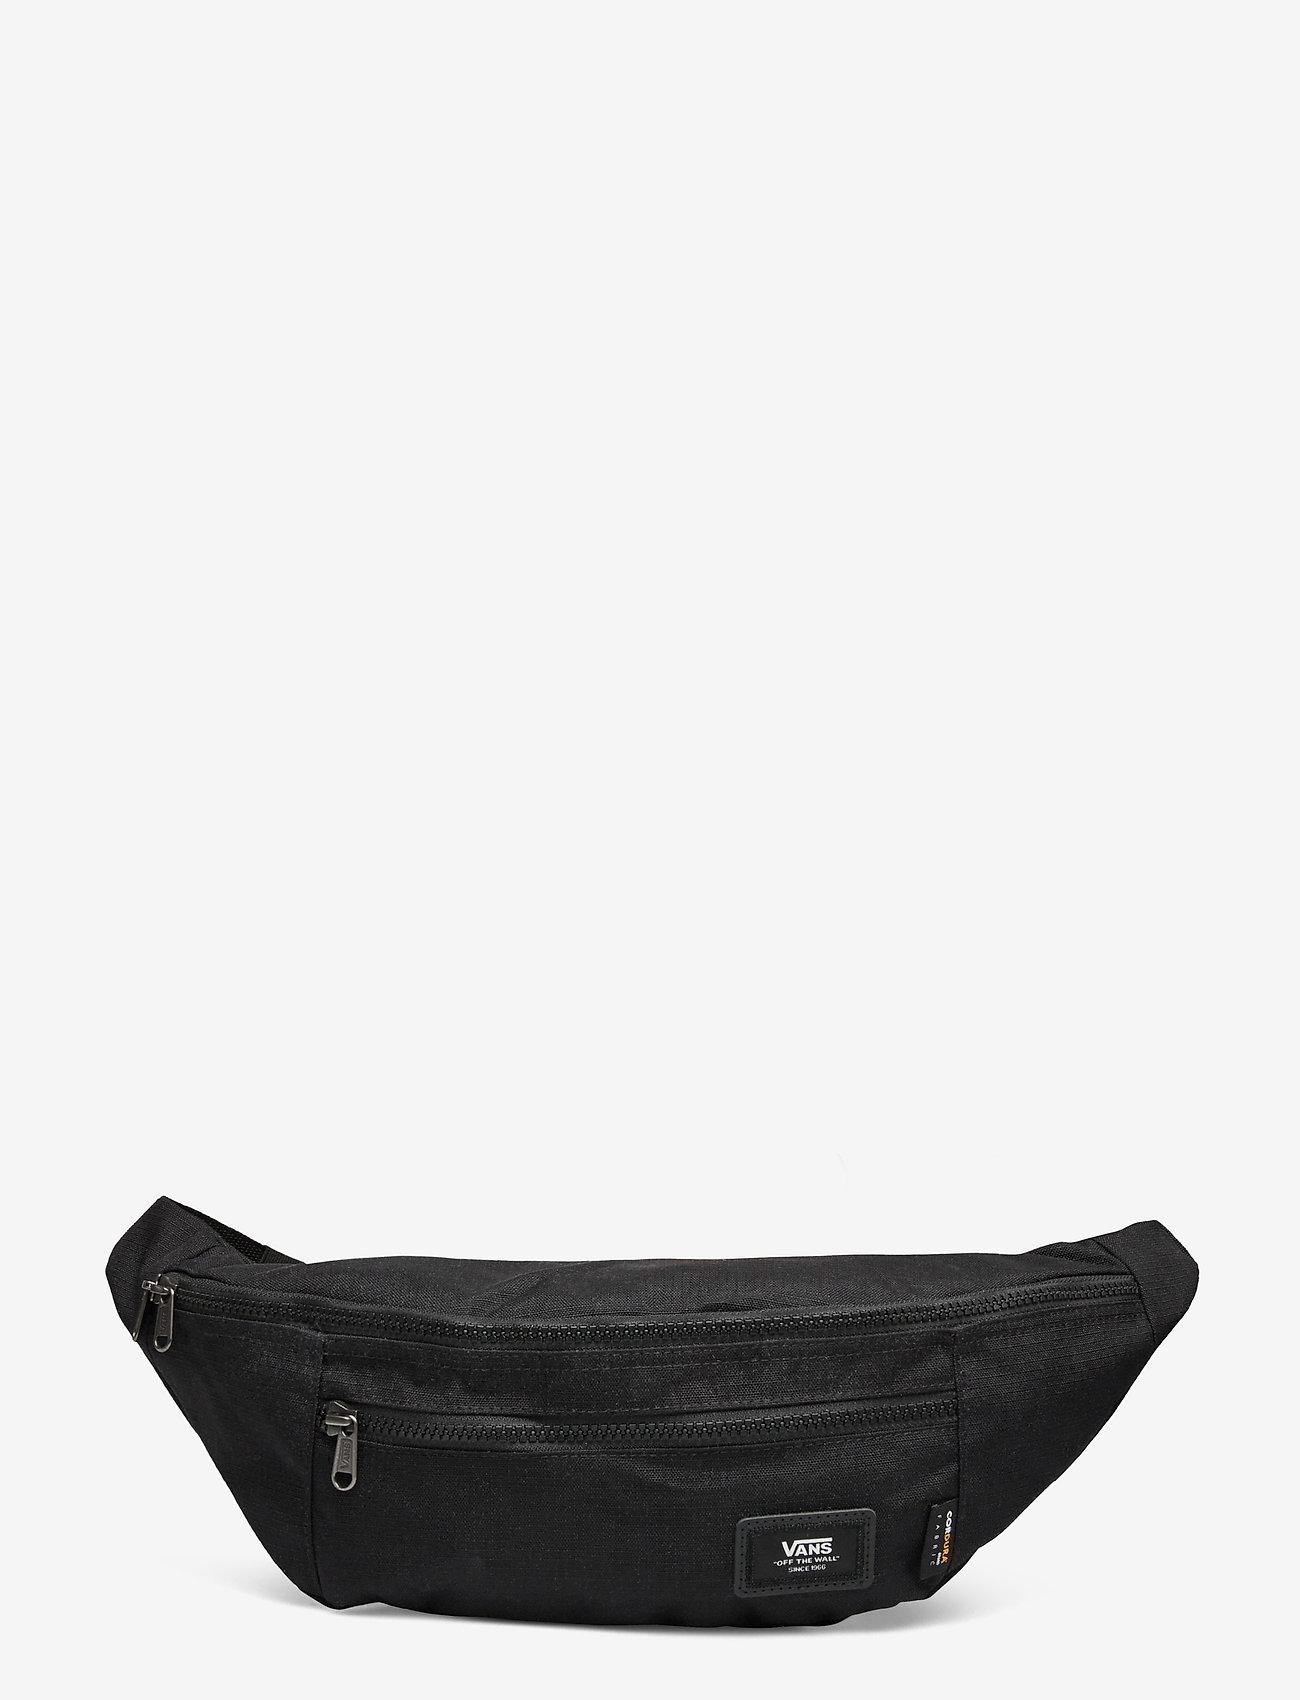 VANS - WARD CROSS BODY PACK - tassen - black ripstop - 0